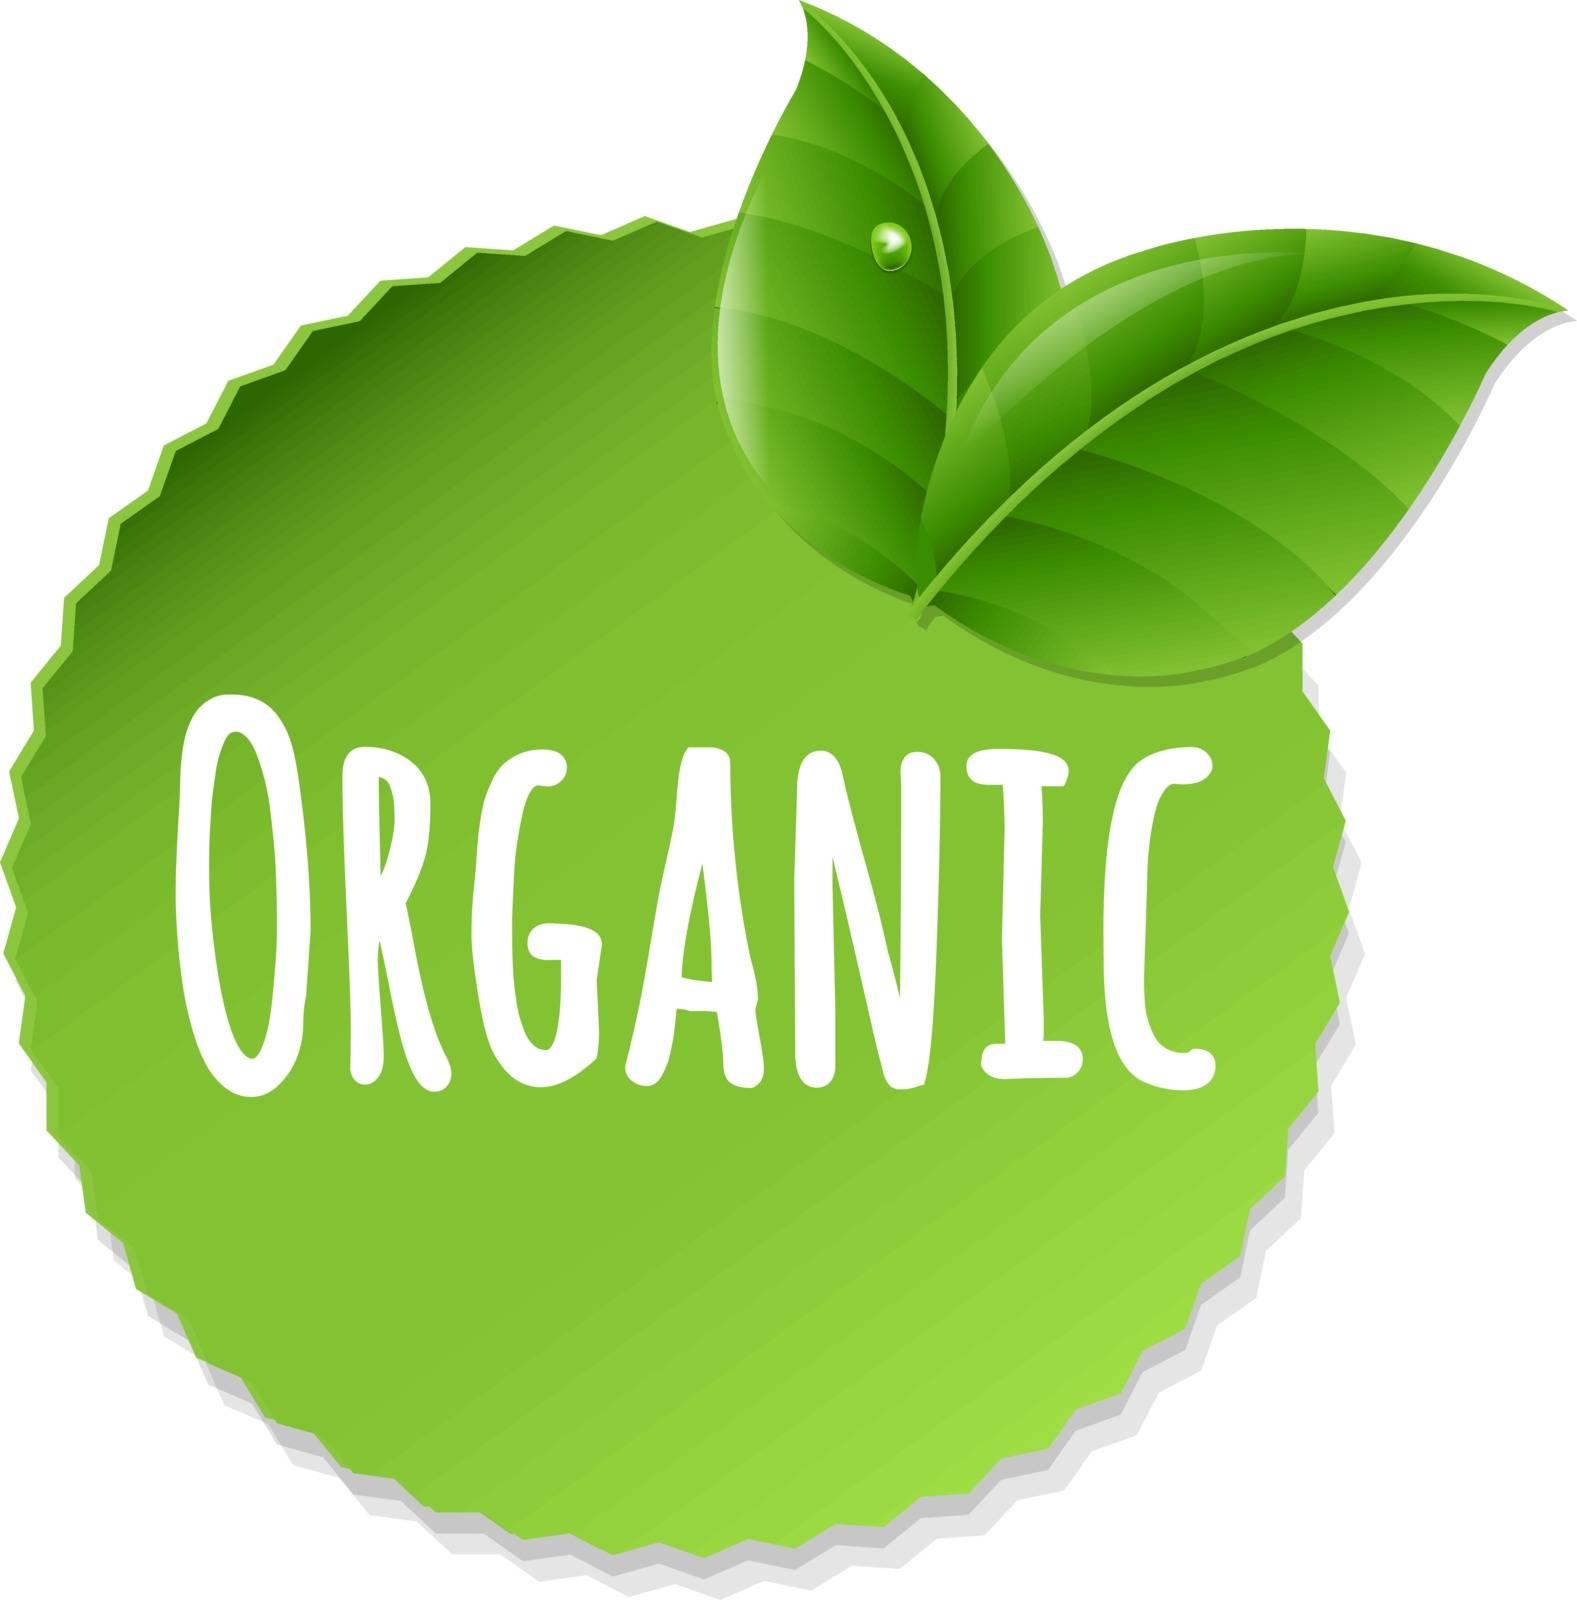 Organic Label With Gradient Mesh, Vector Illustration